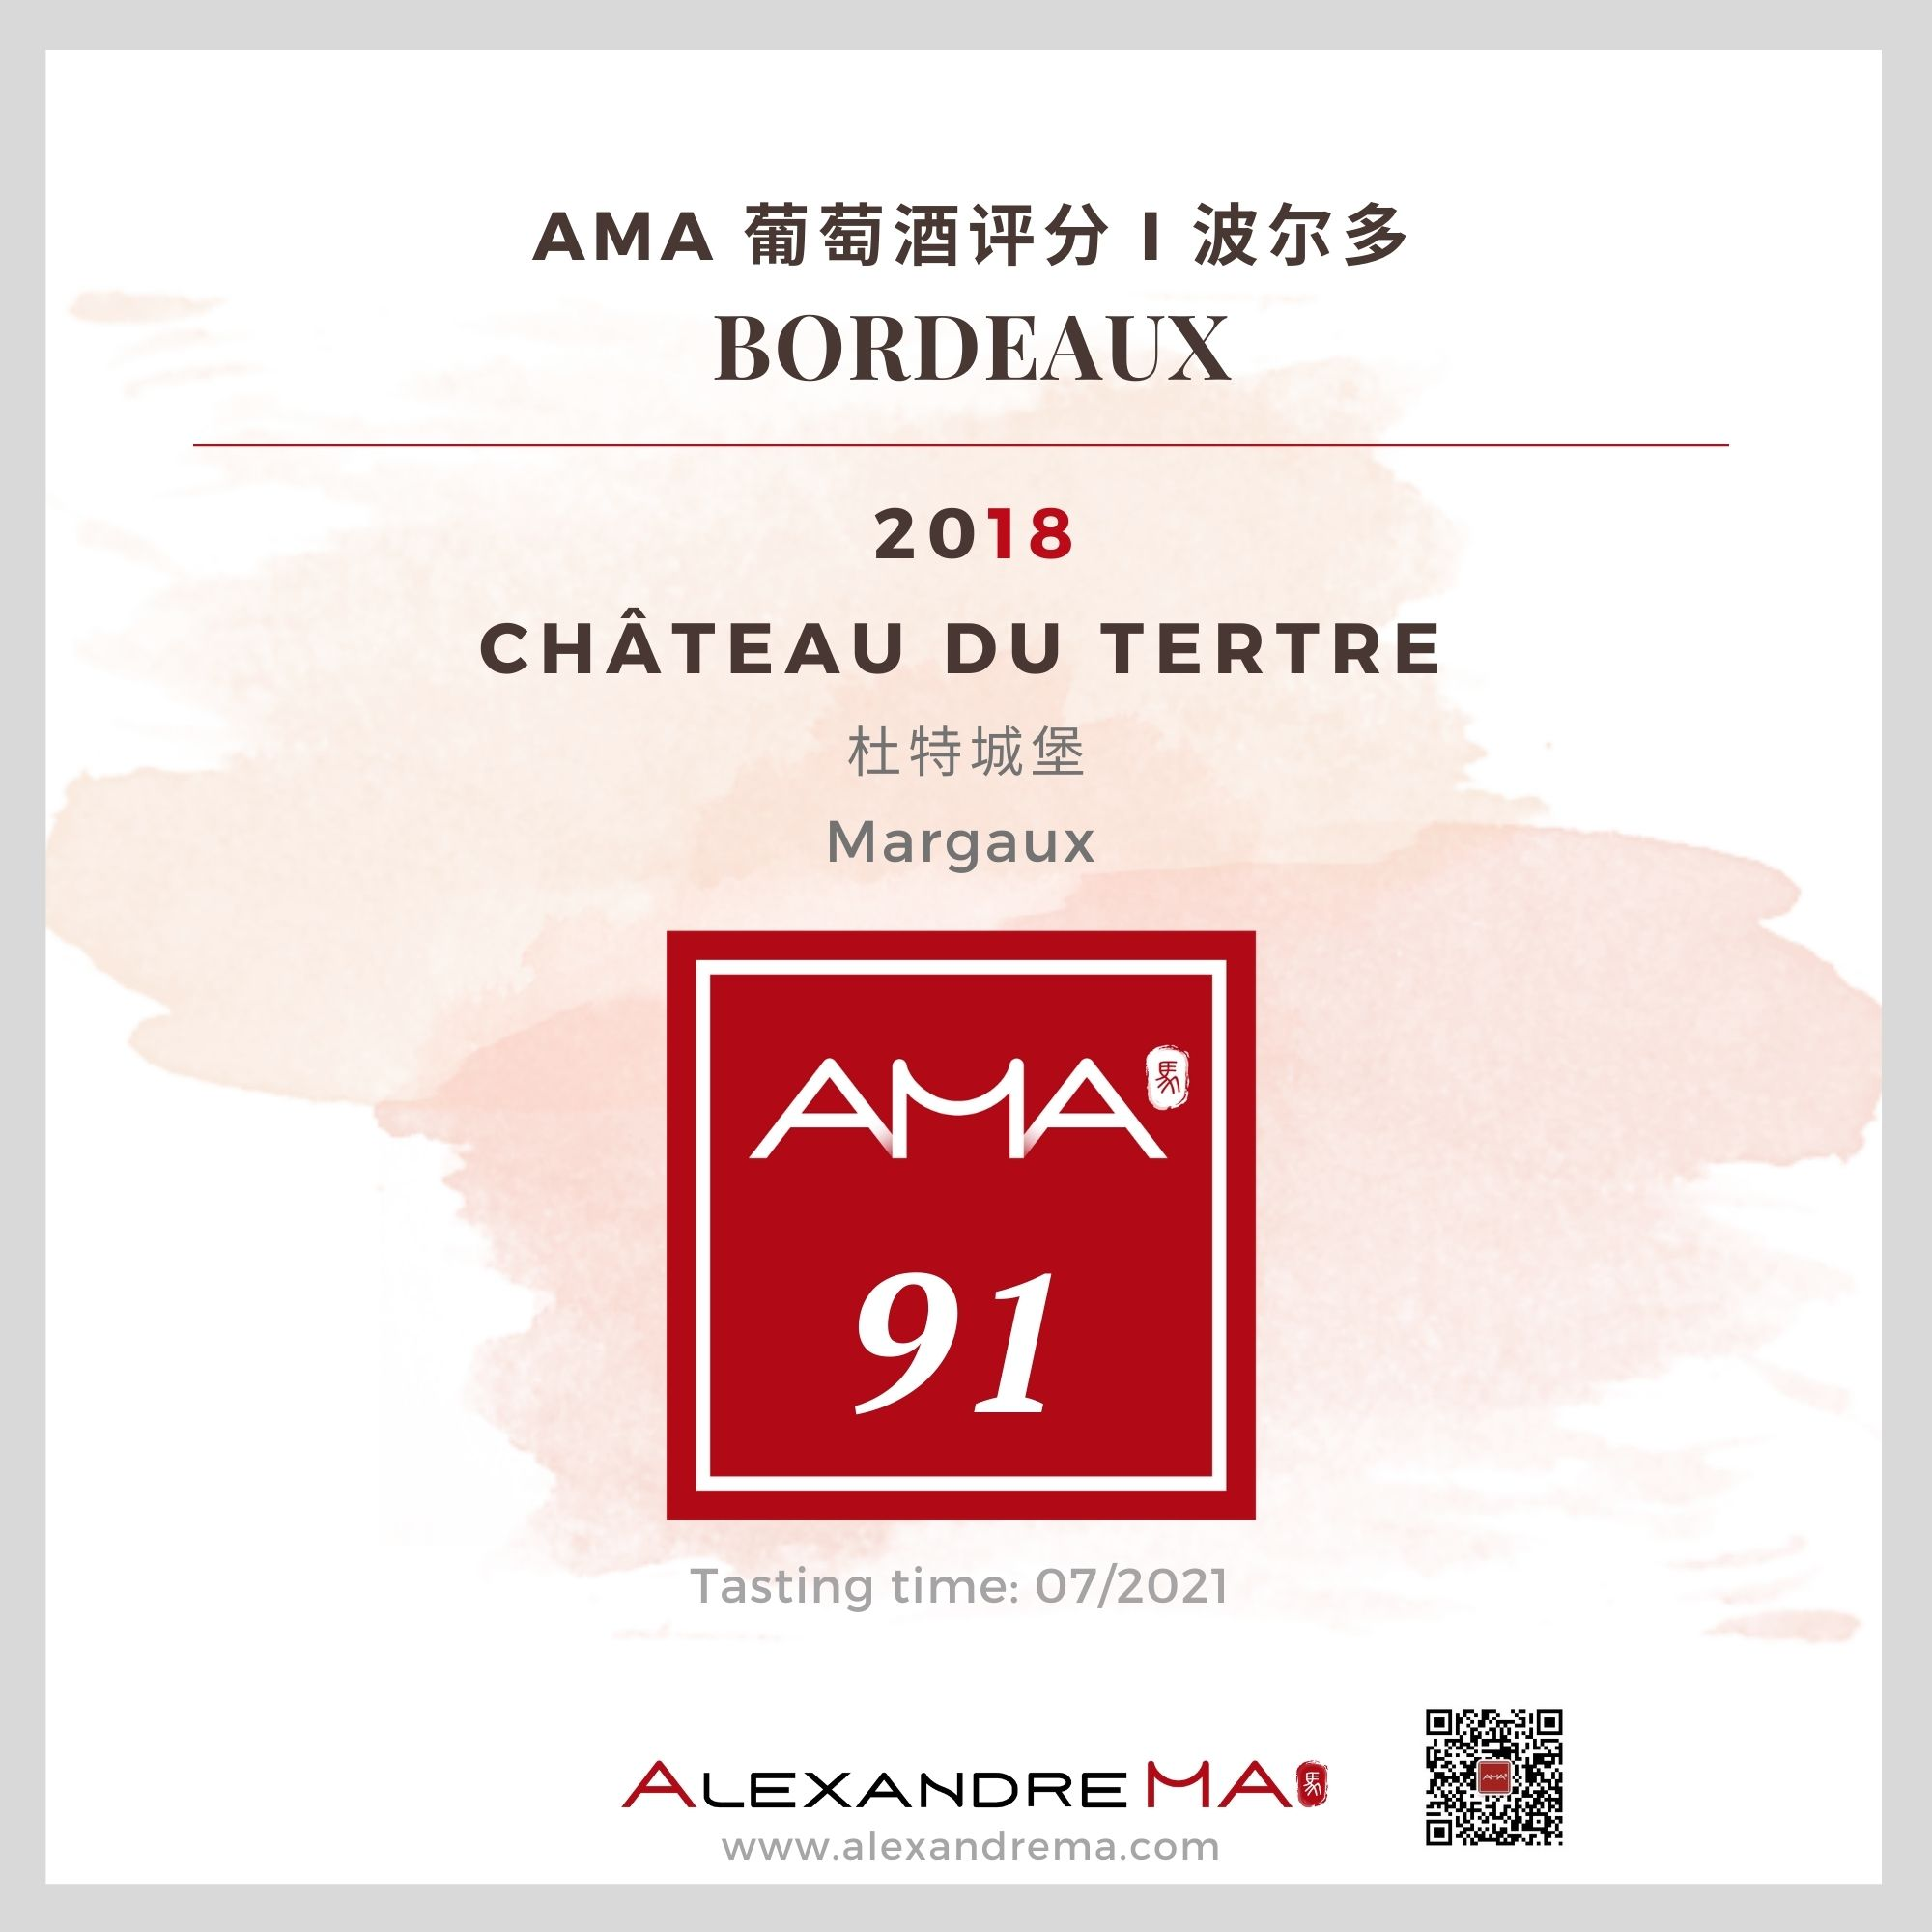 Château du Tertre 2018 杜特城堡 - Alexandre Ma